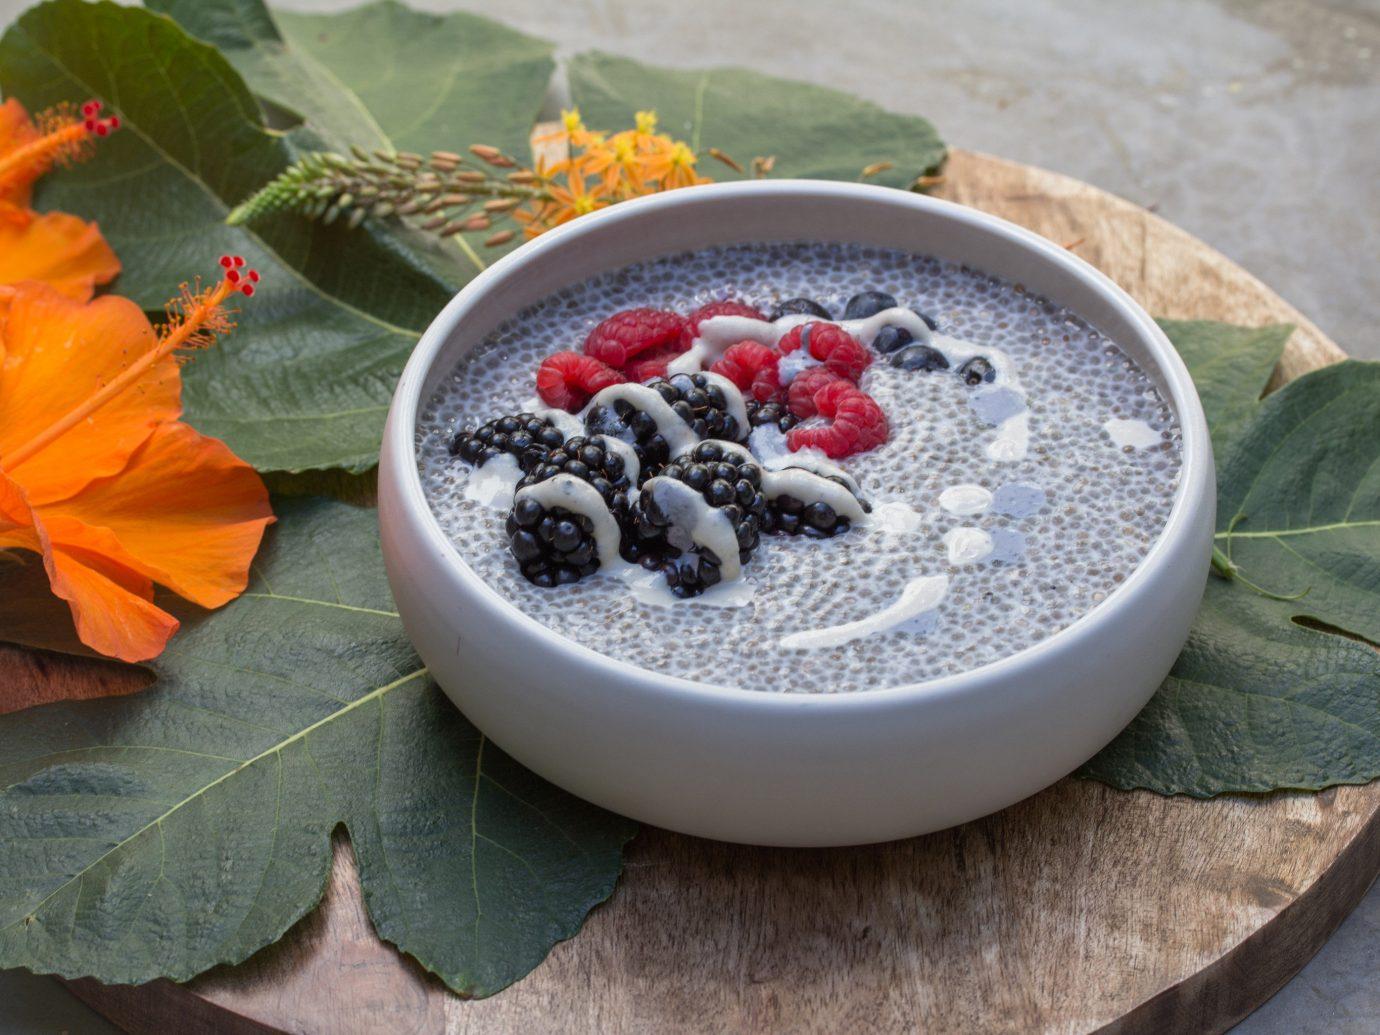 Health + Wellness Meditation Retreats Offbeat Spa Retreats Yoga Retreats food plant produce leaf flower fruit herb berry orange fresh